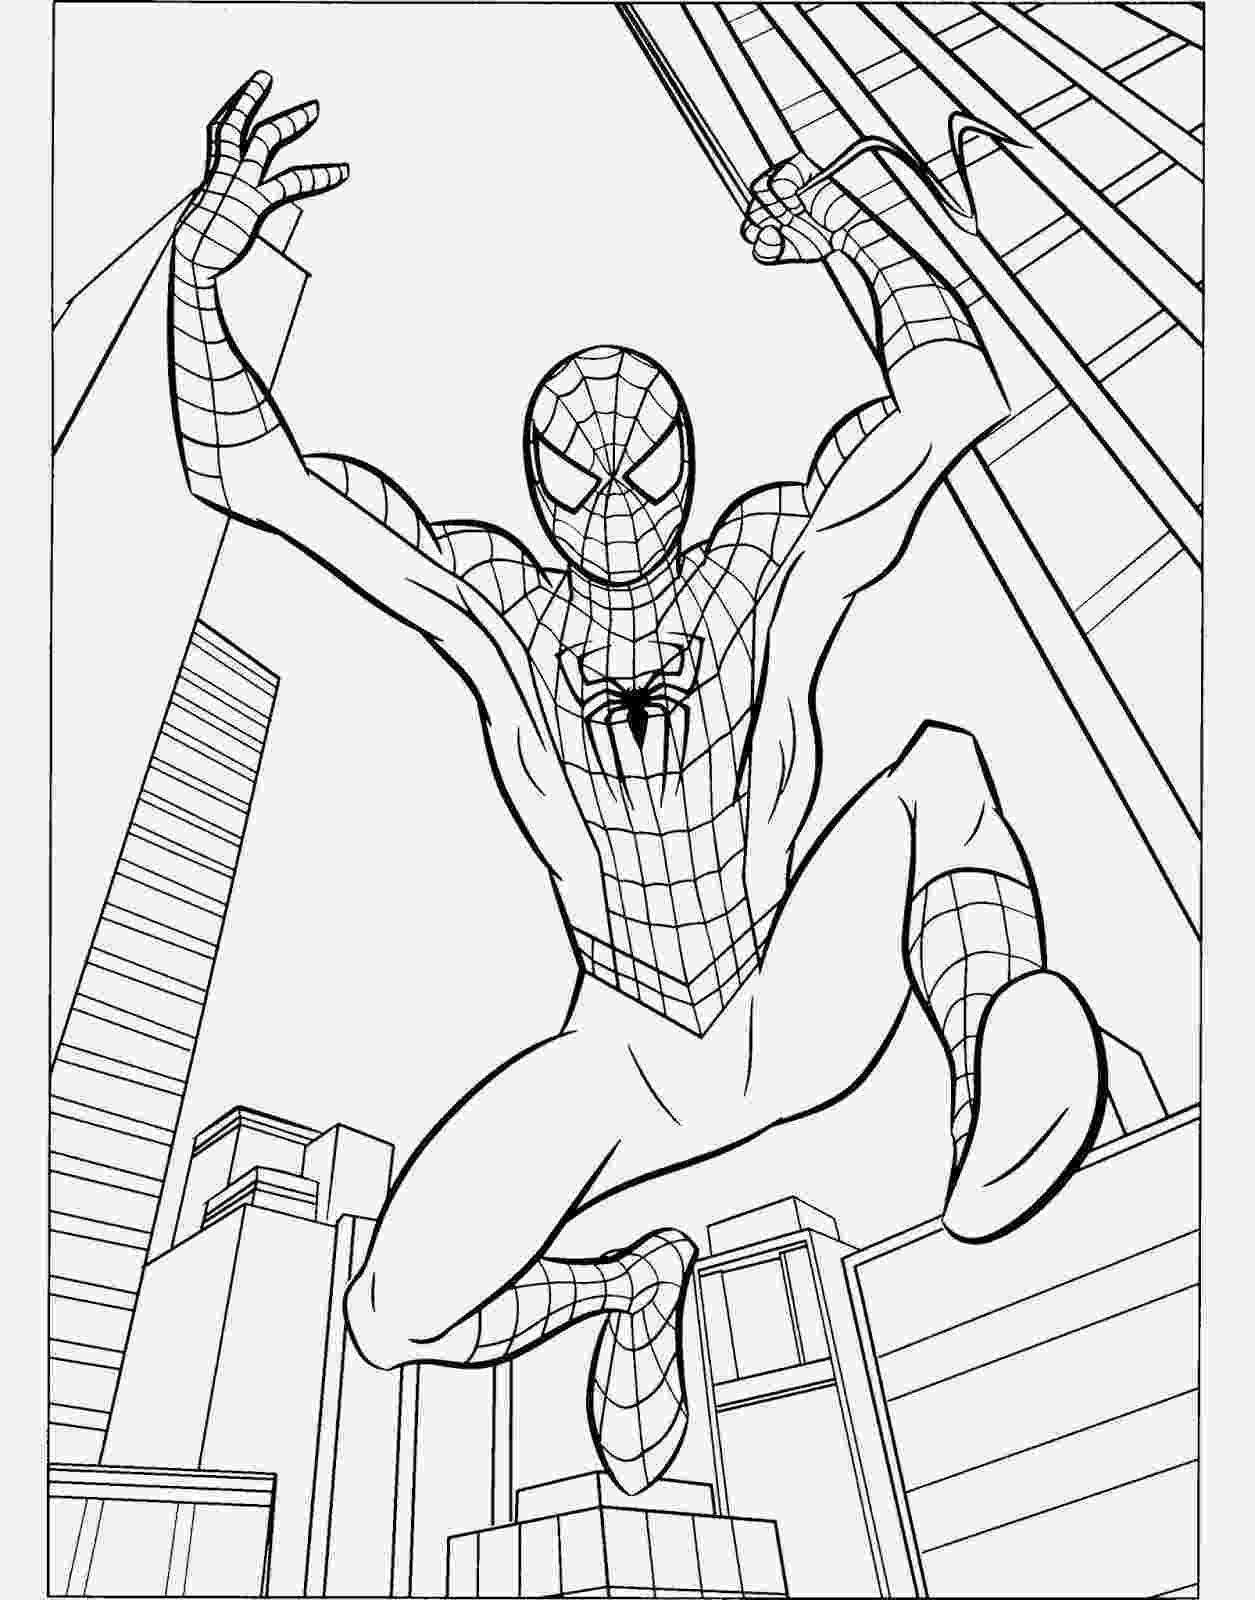 spiderman coloring sheet spider man coloring page spiderman coloring superhero spiderman sheet coloring